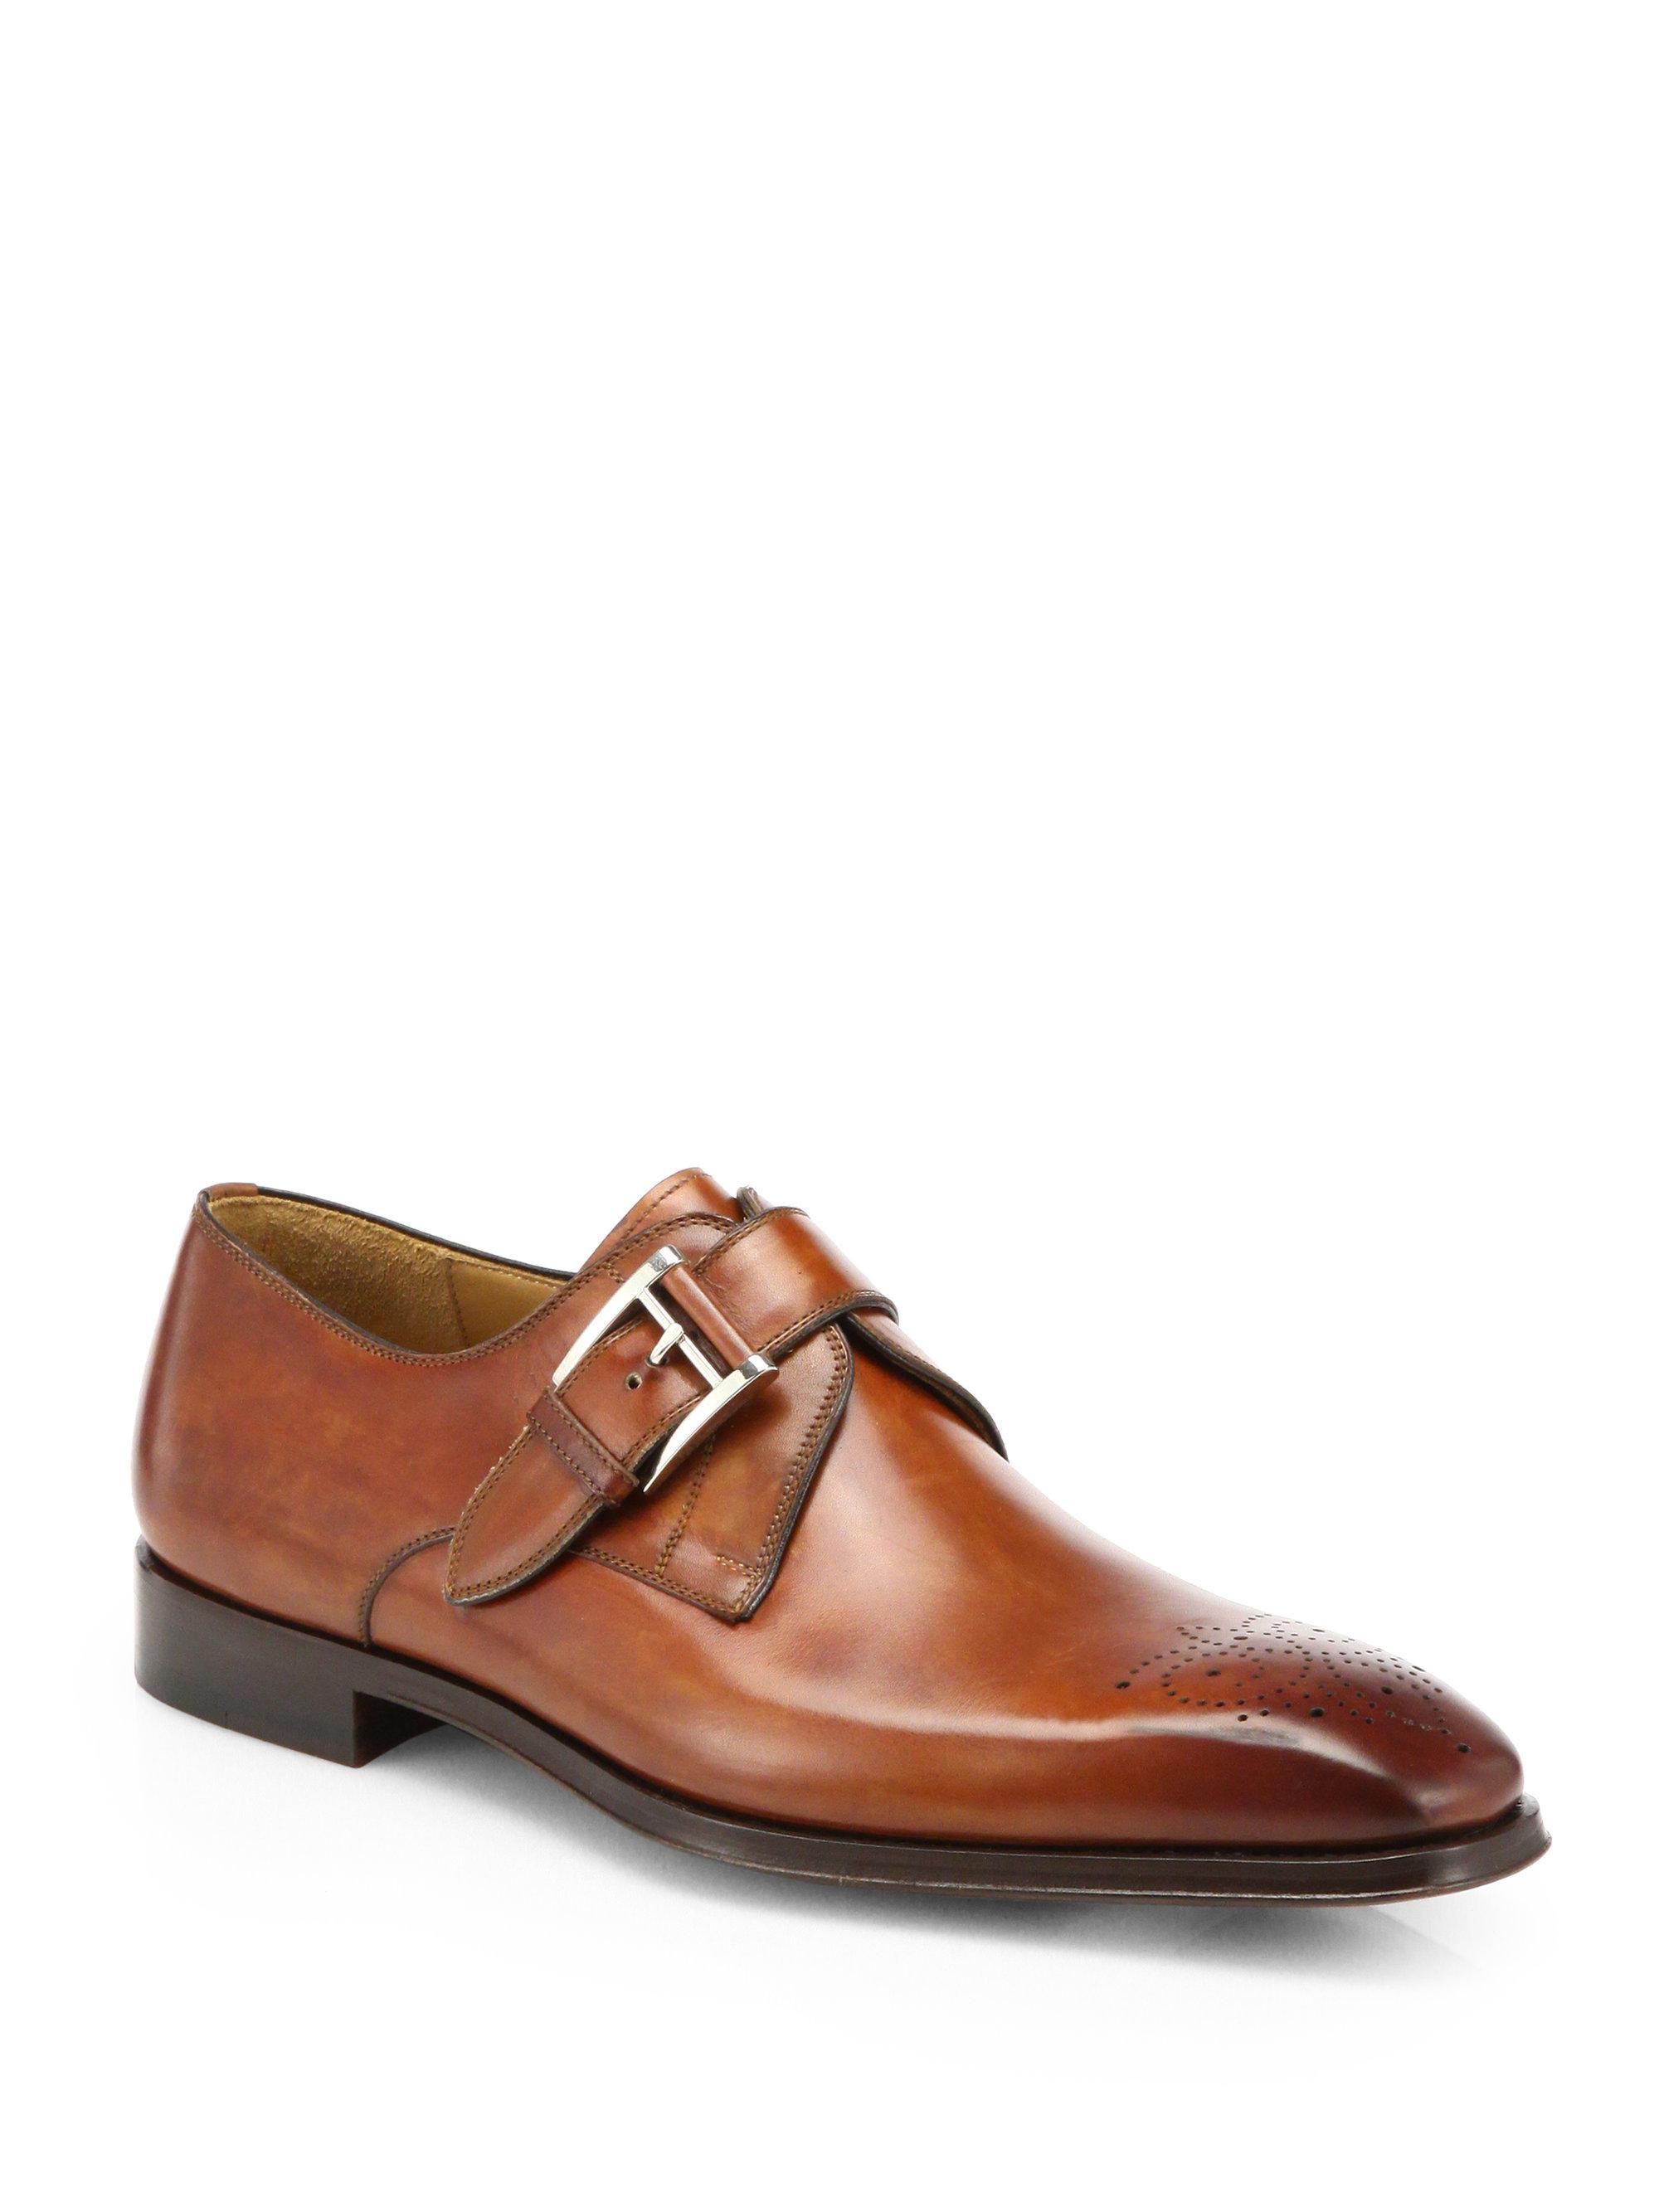 Saks Fifth Avenue COLLECTION Double Monk-Strap Leather Shoes paufn